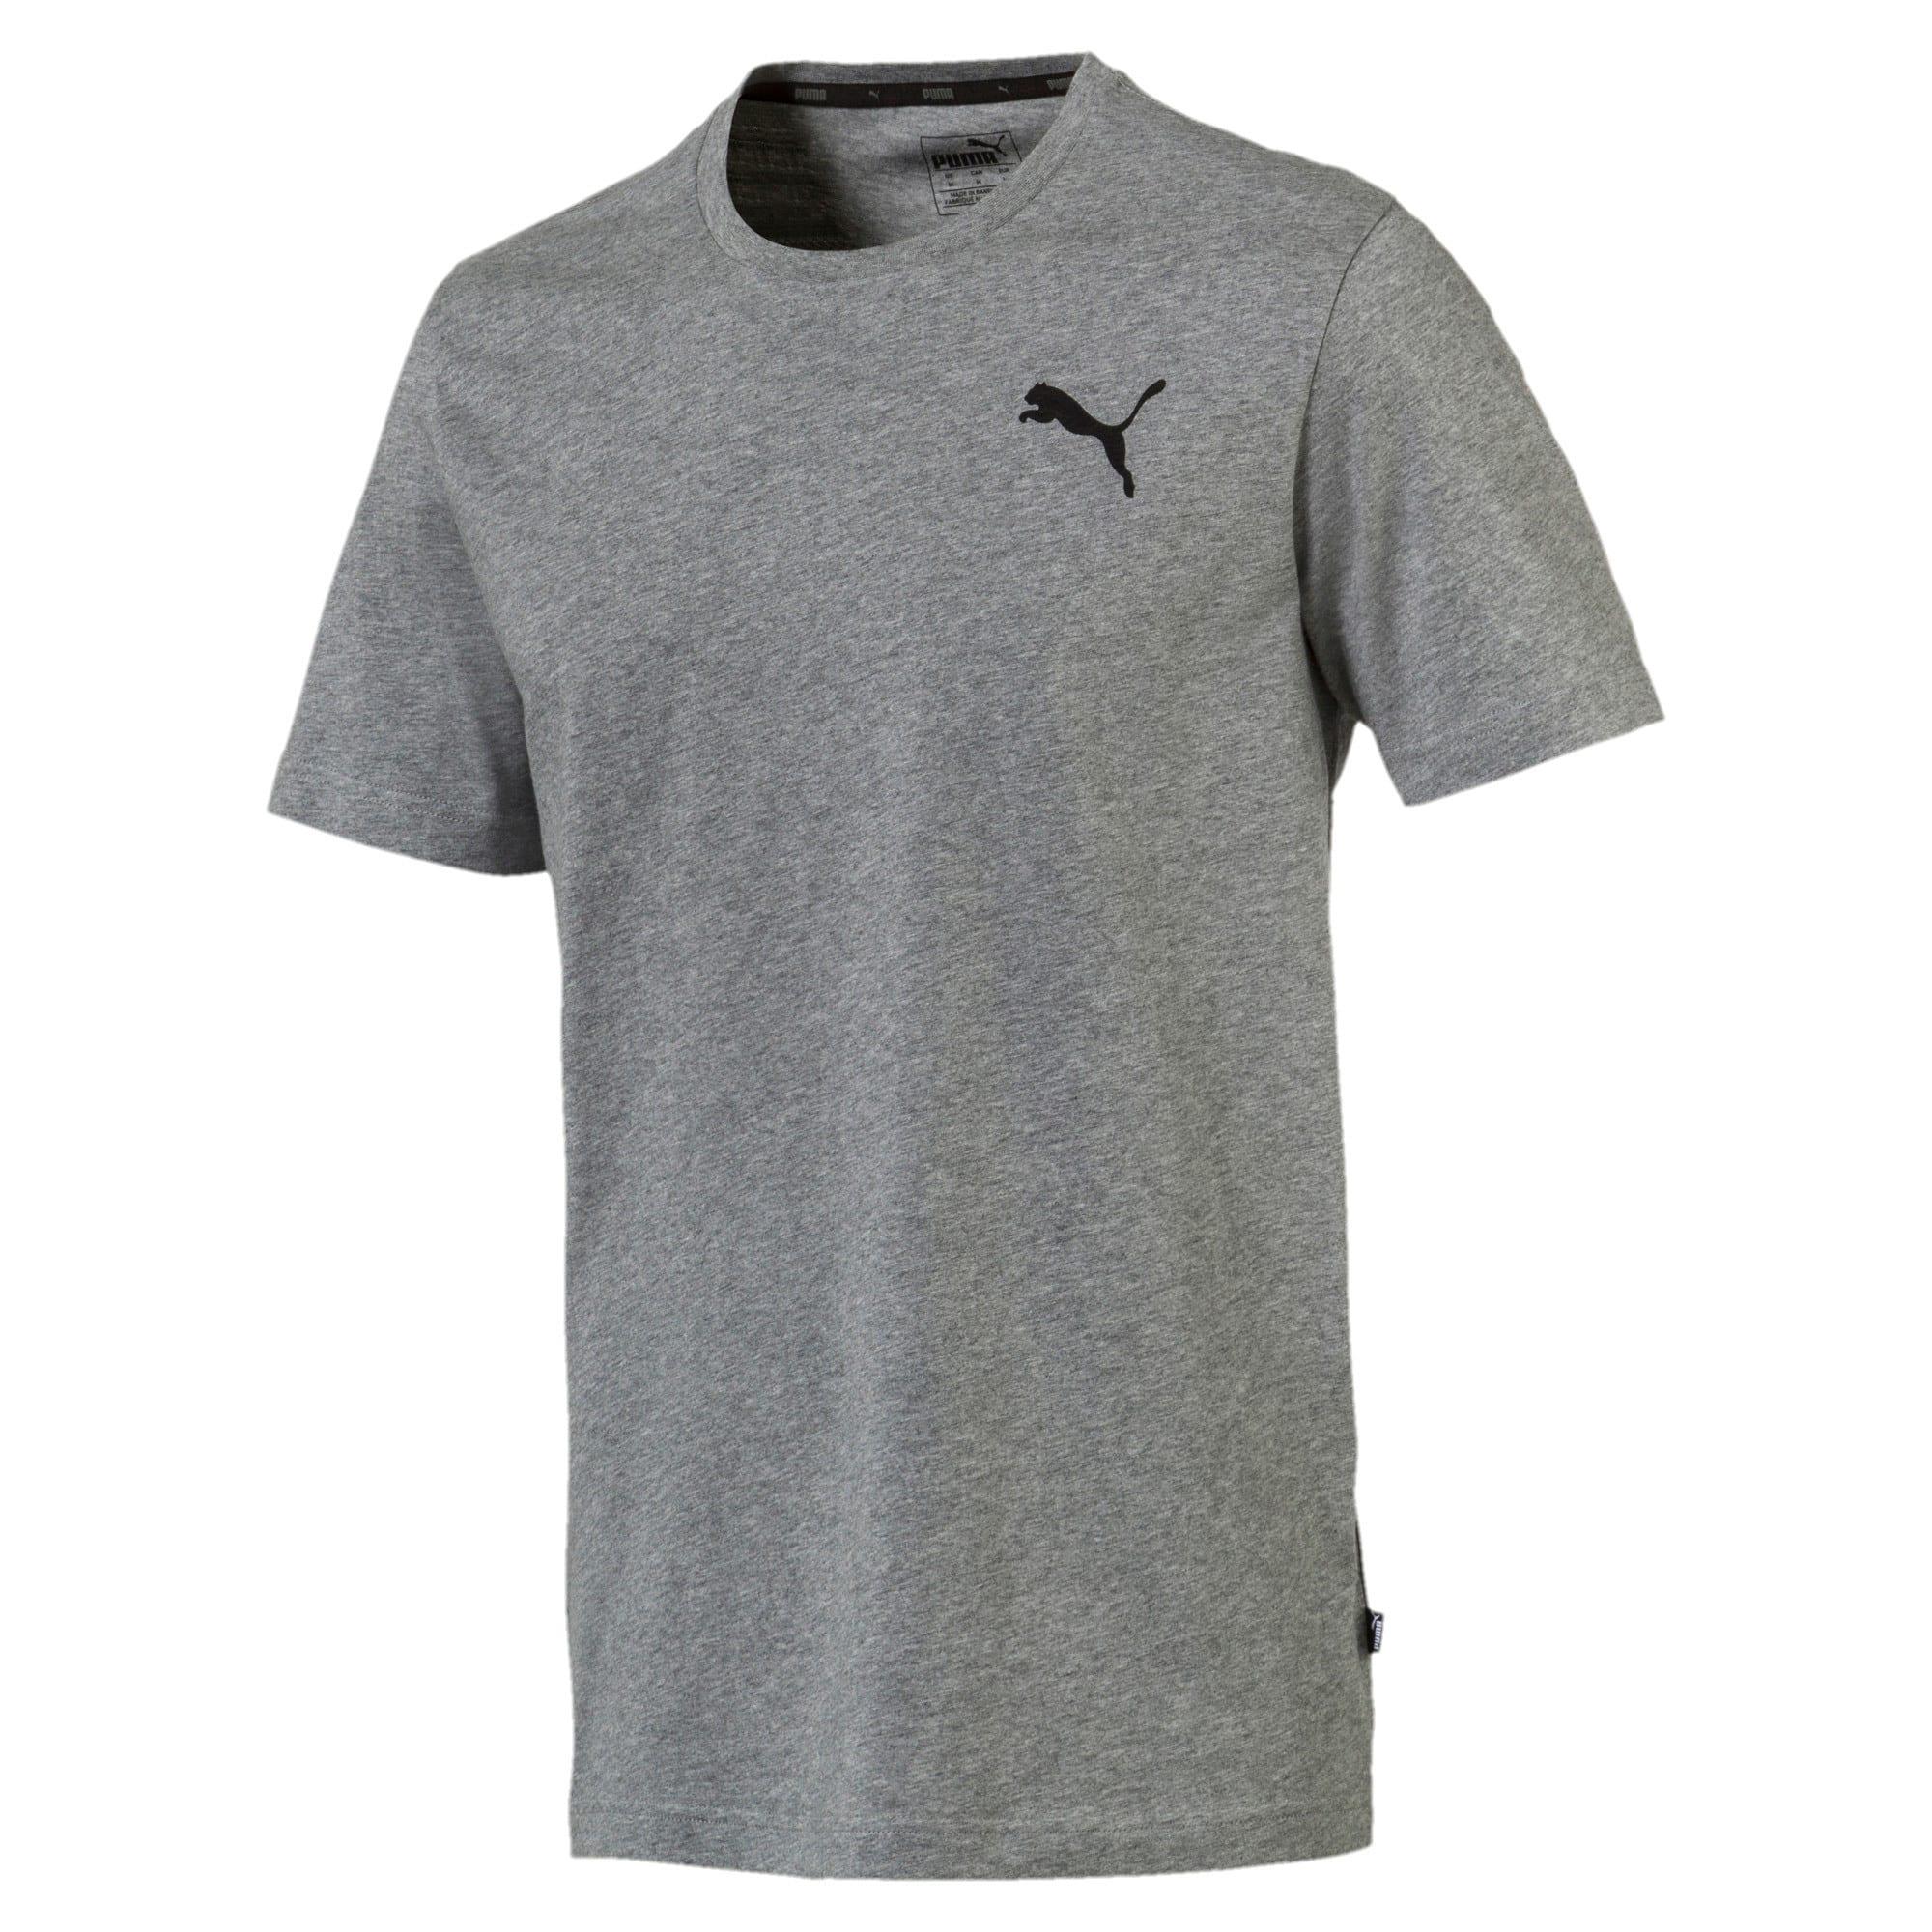 Thumbnail 4 of T-shirt con logo piccolo Essentials uomo, Medium Gray Heather-_Cat, medium